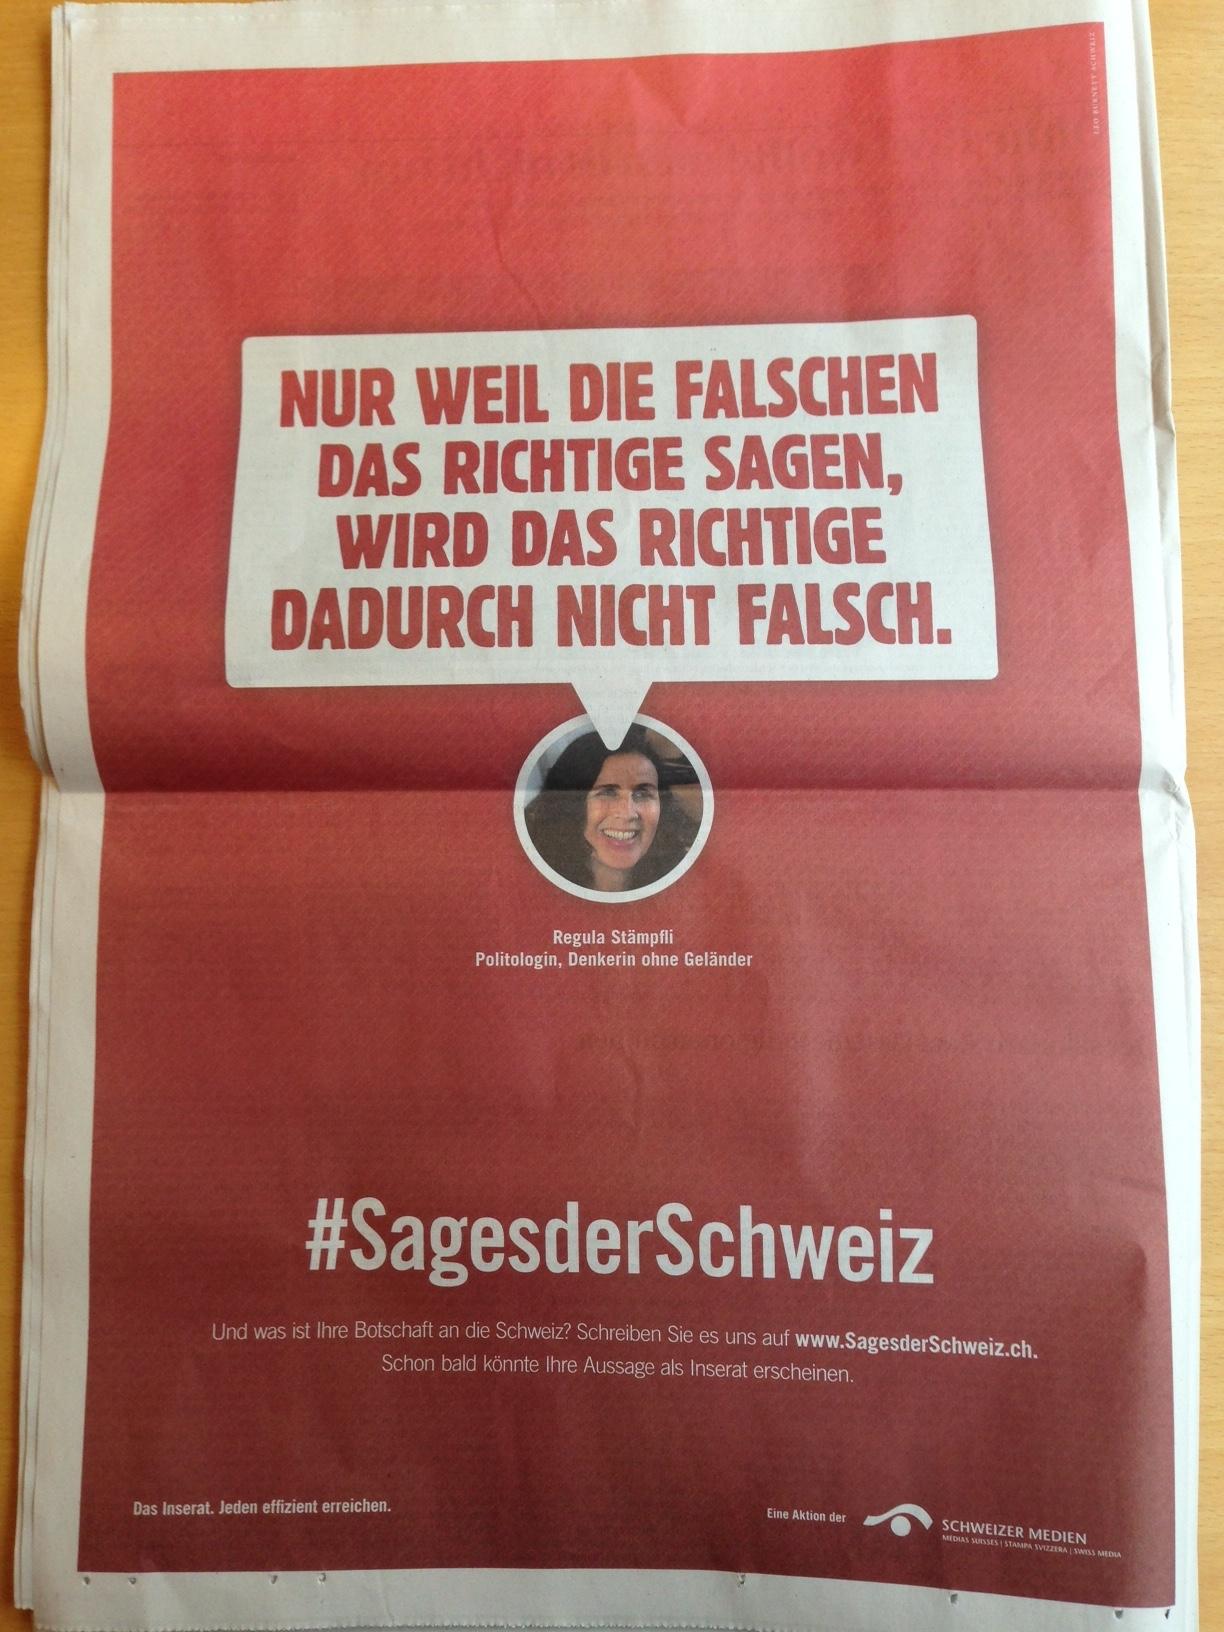 #SagesderSchweiz TA Sujet